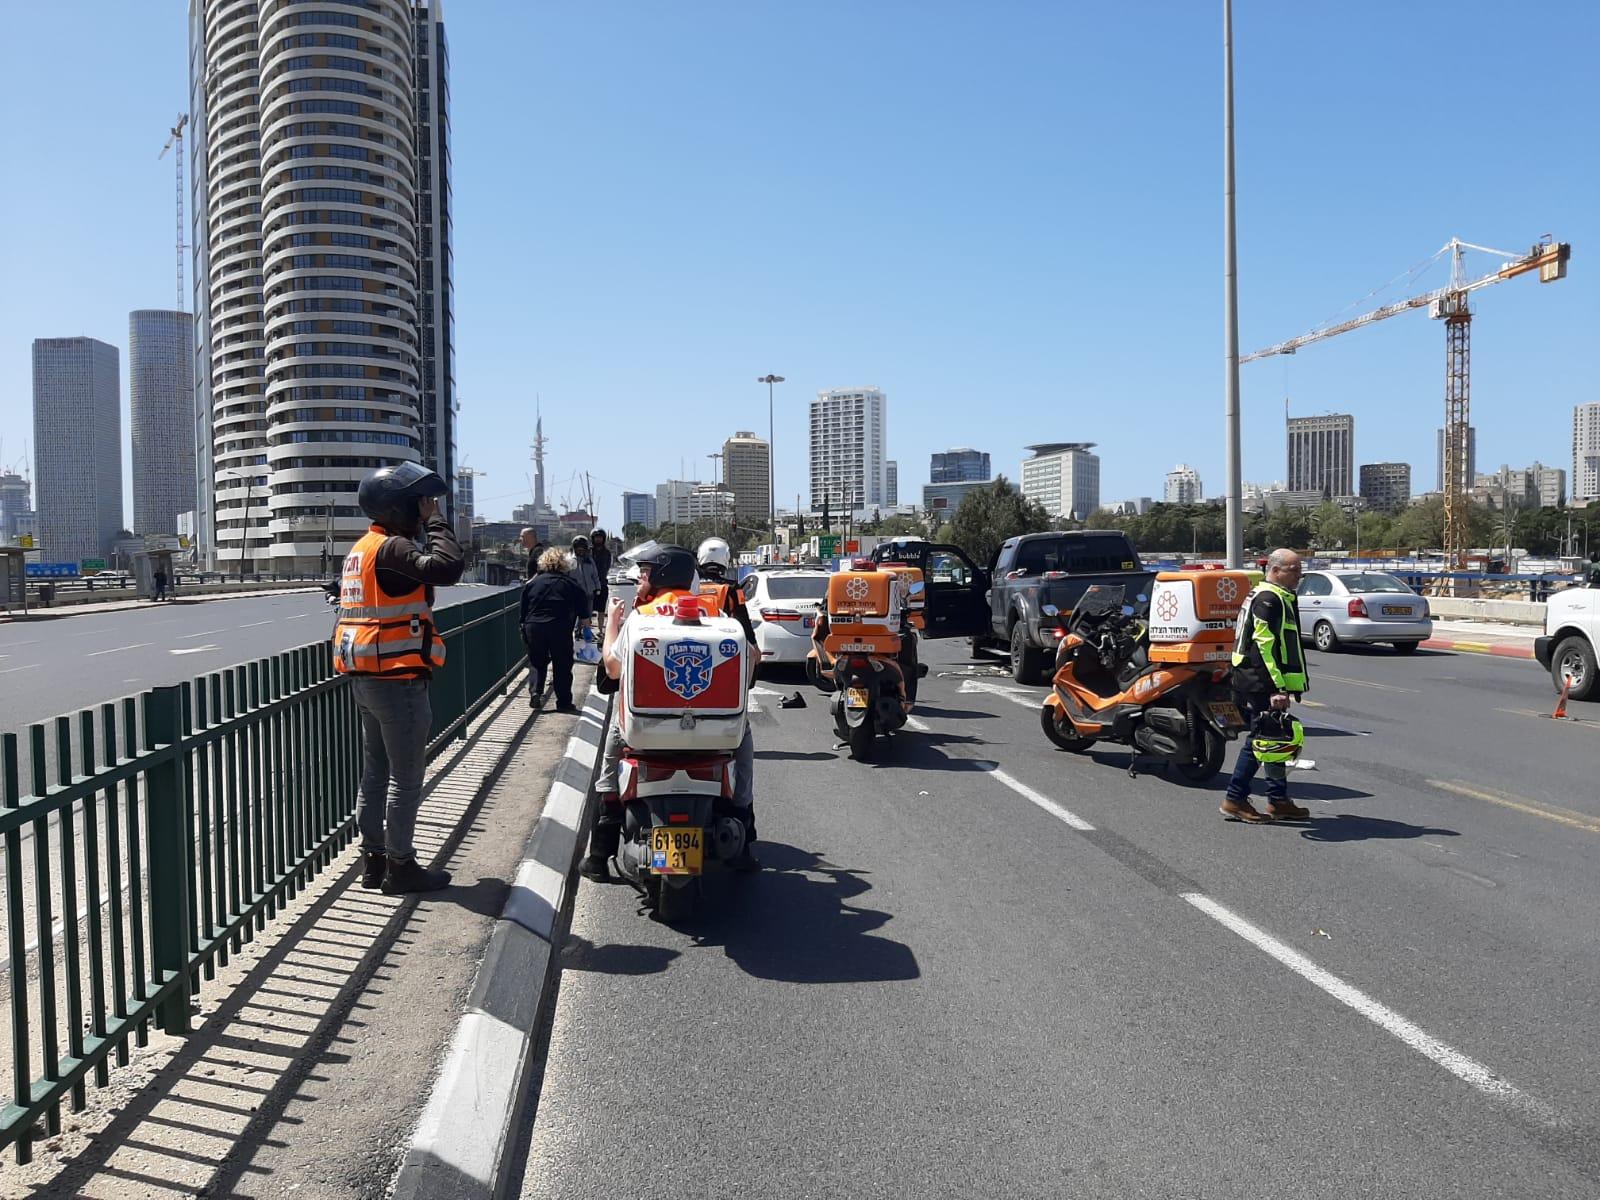 Photo of רוכב אופנוע ורוכב אופניים חשמליים נפצעו בתאונה עם רכב ברמת גן. מצבם קל ובינוני